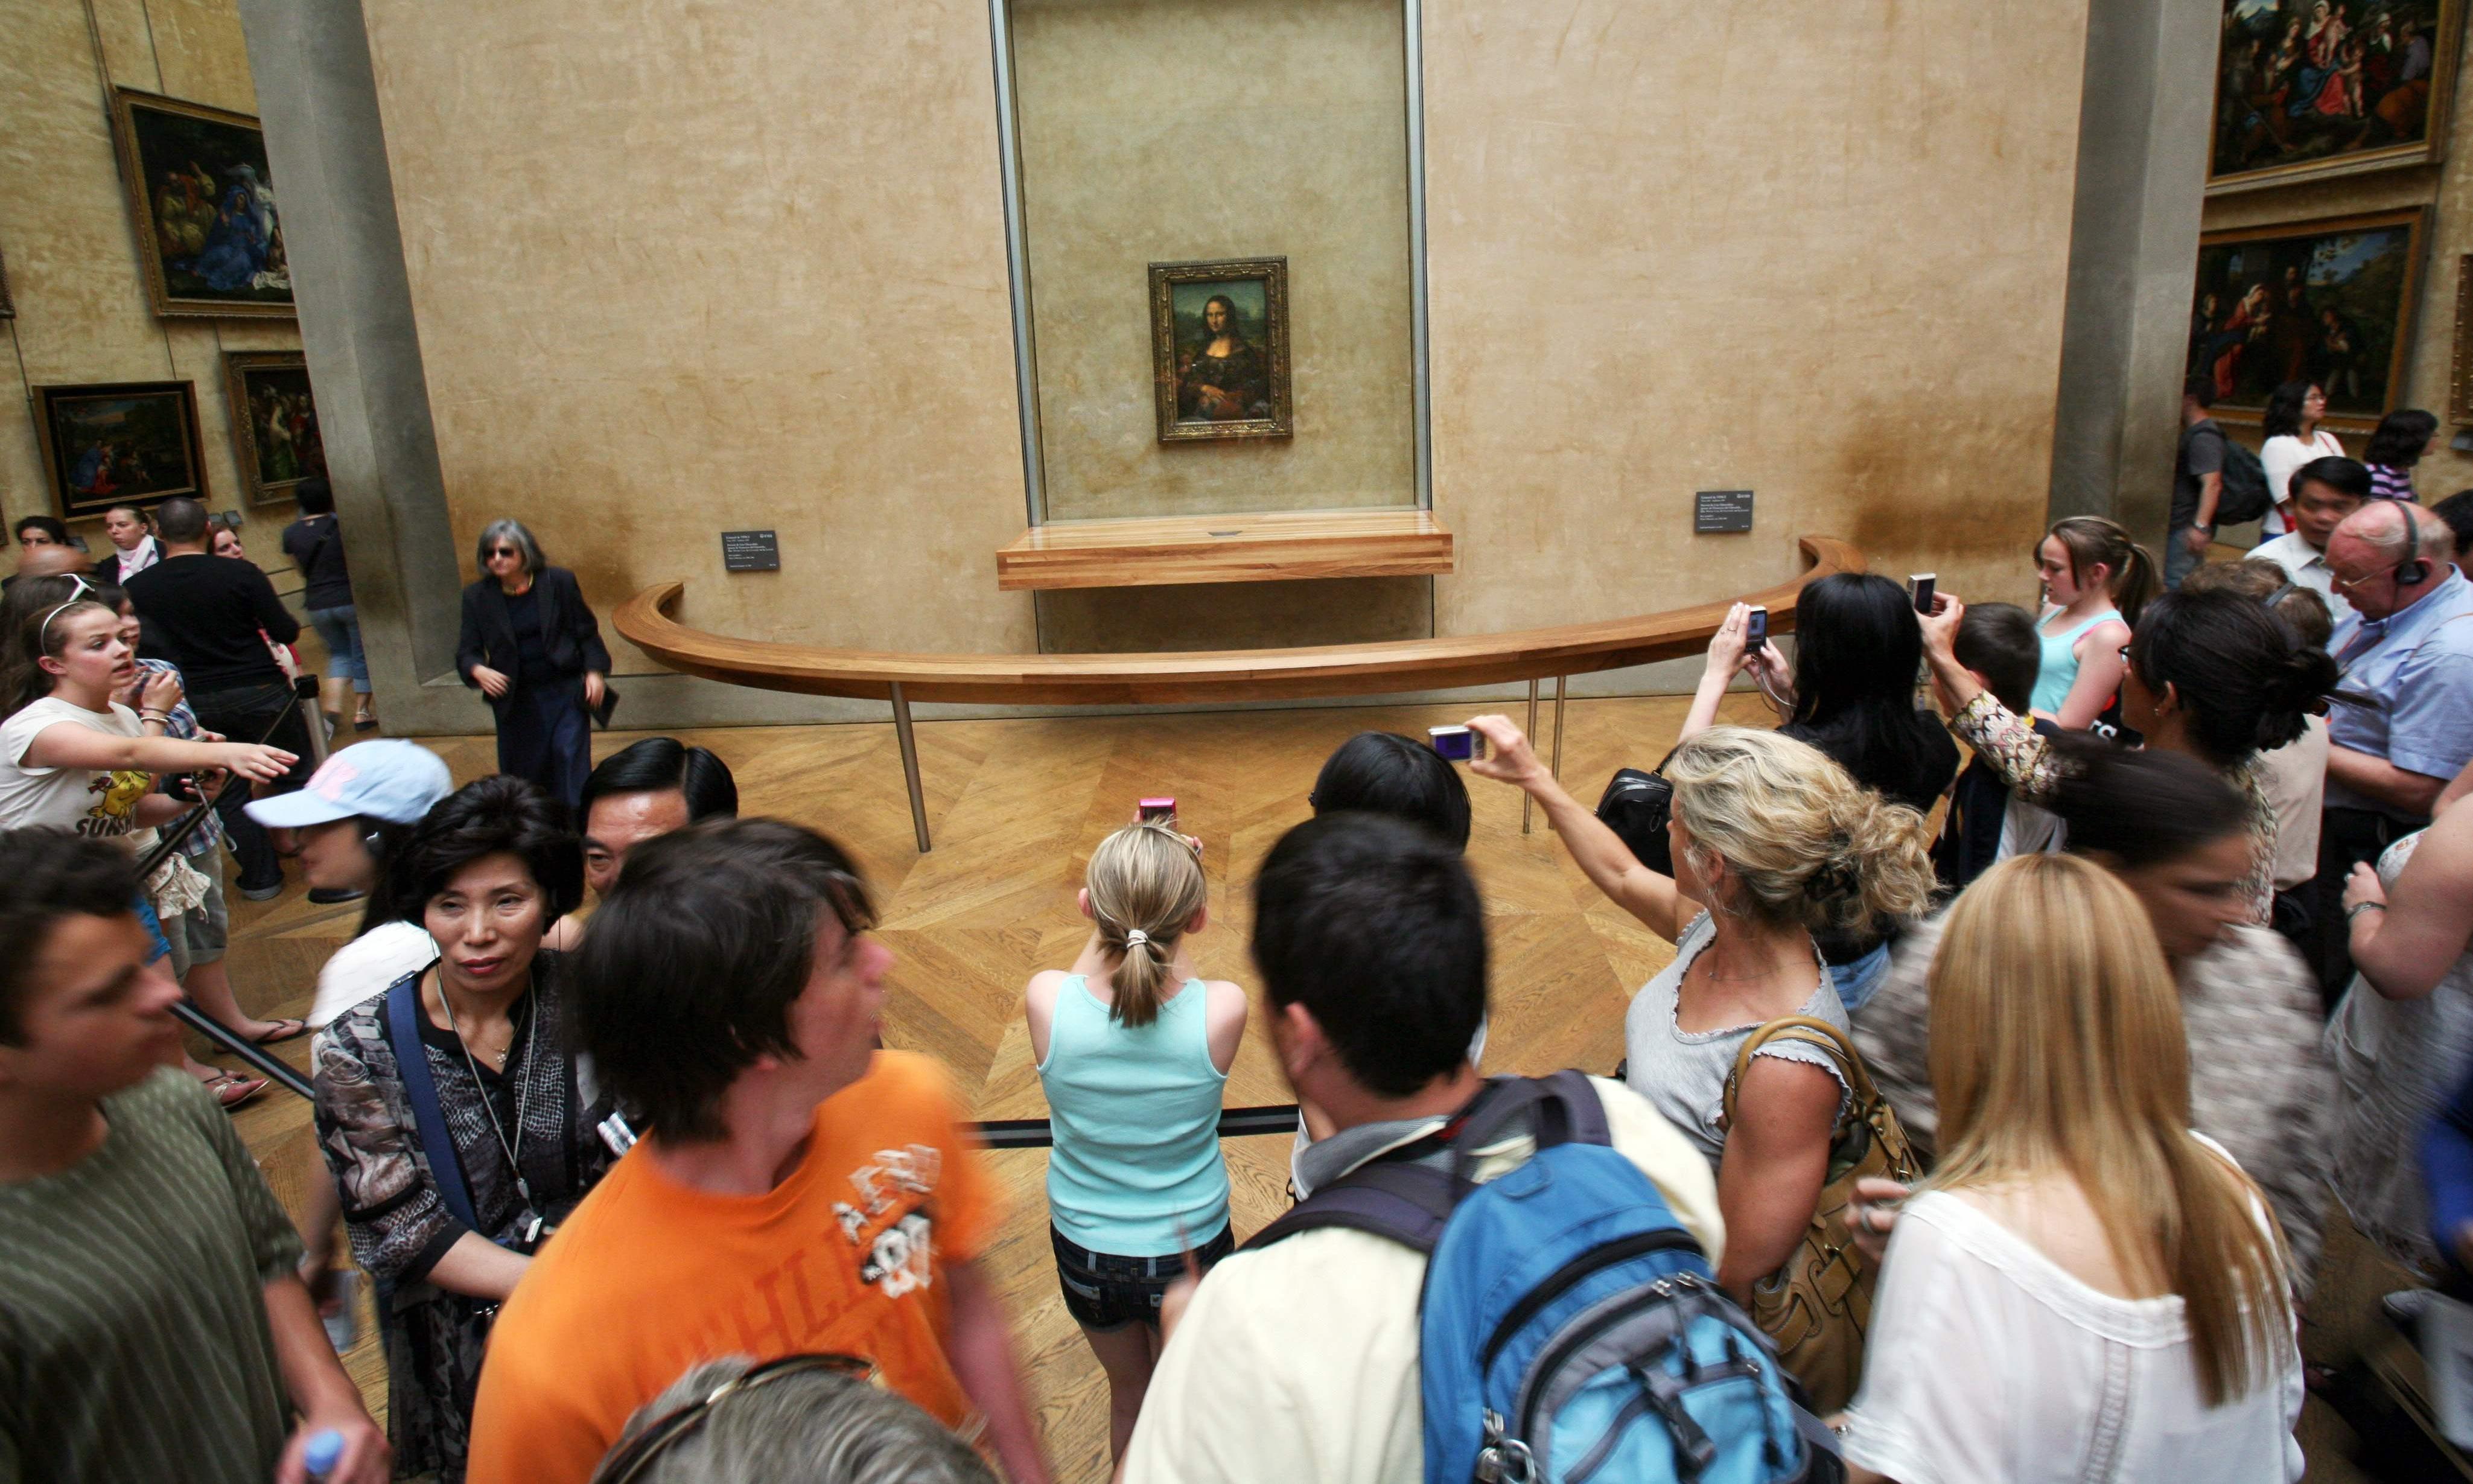 Mona Lisa fans decry brief encounter with their idol in Paris